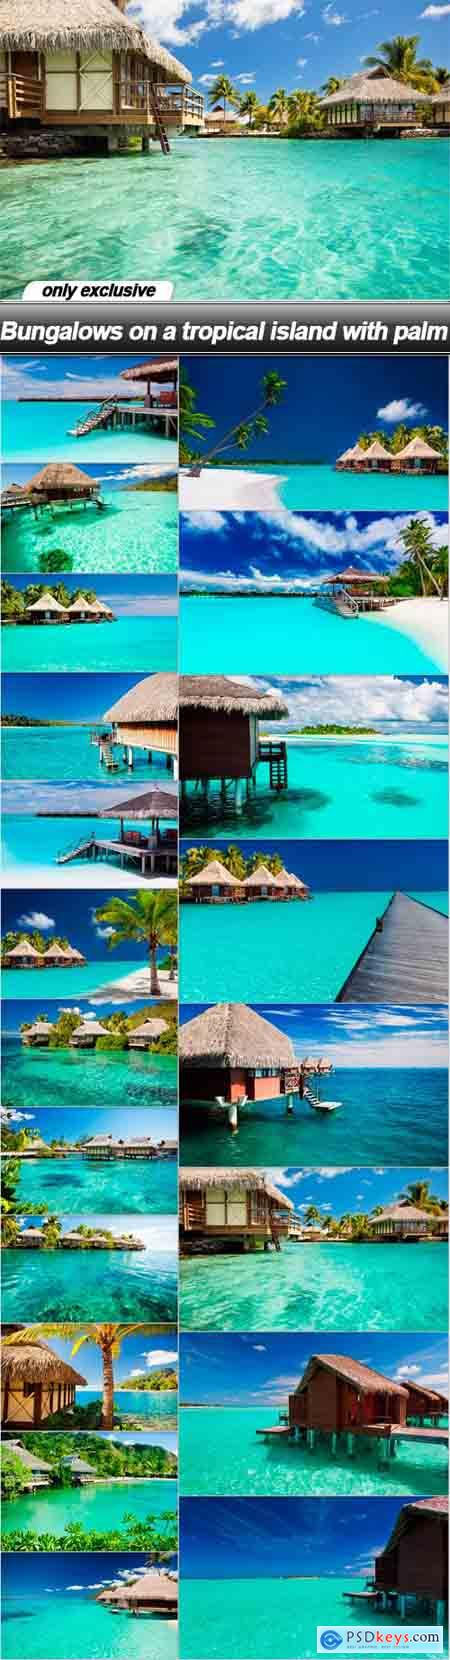 Bungalows on a tropical island with palm - 20 UHQ JPEG